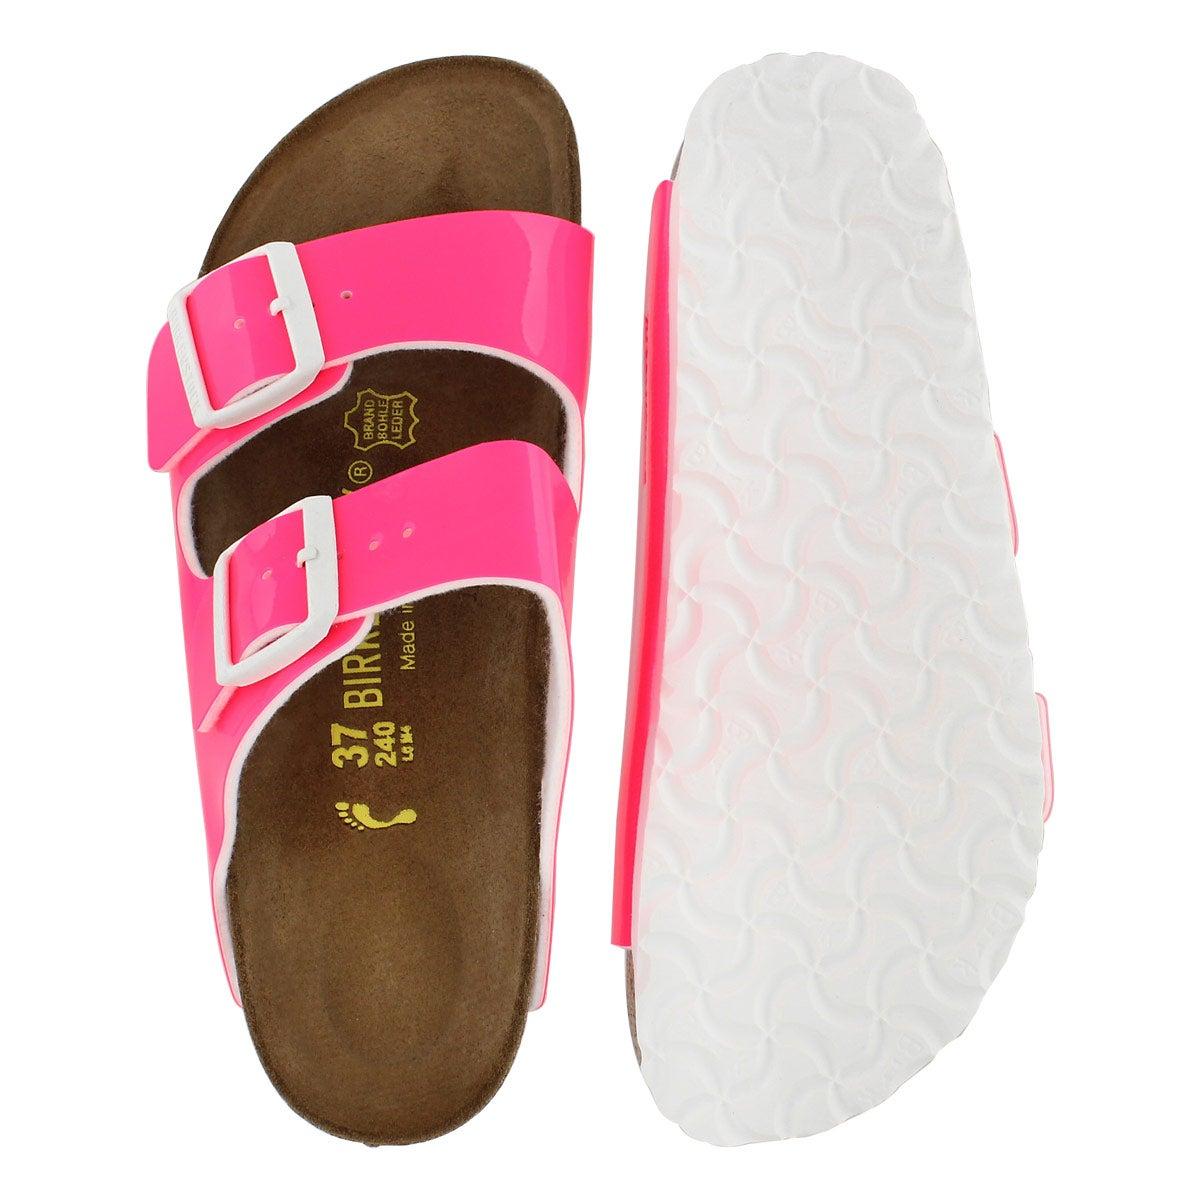 Lds Arizona neon pink 2 strap sandal-Nar